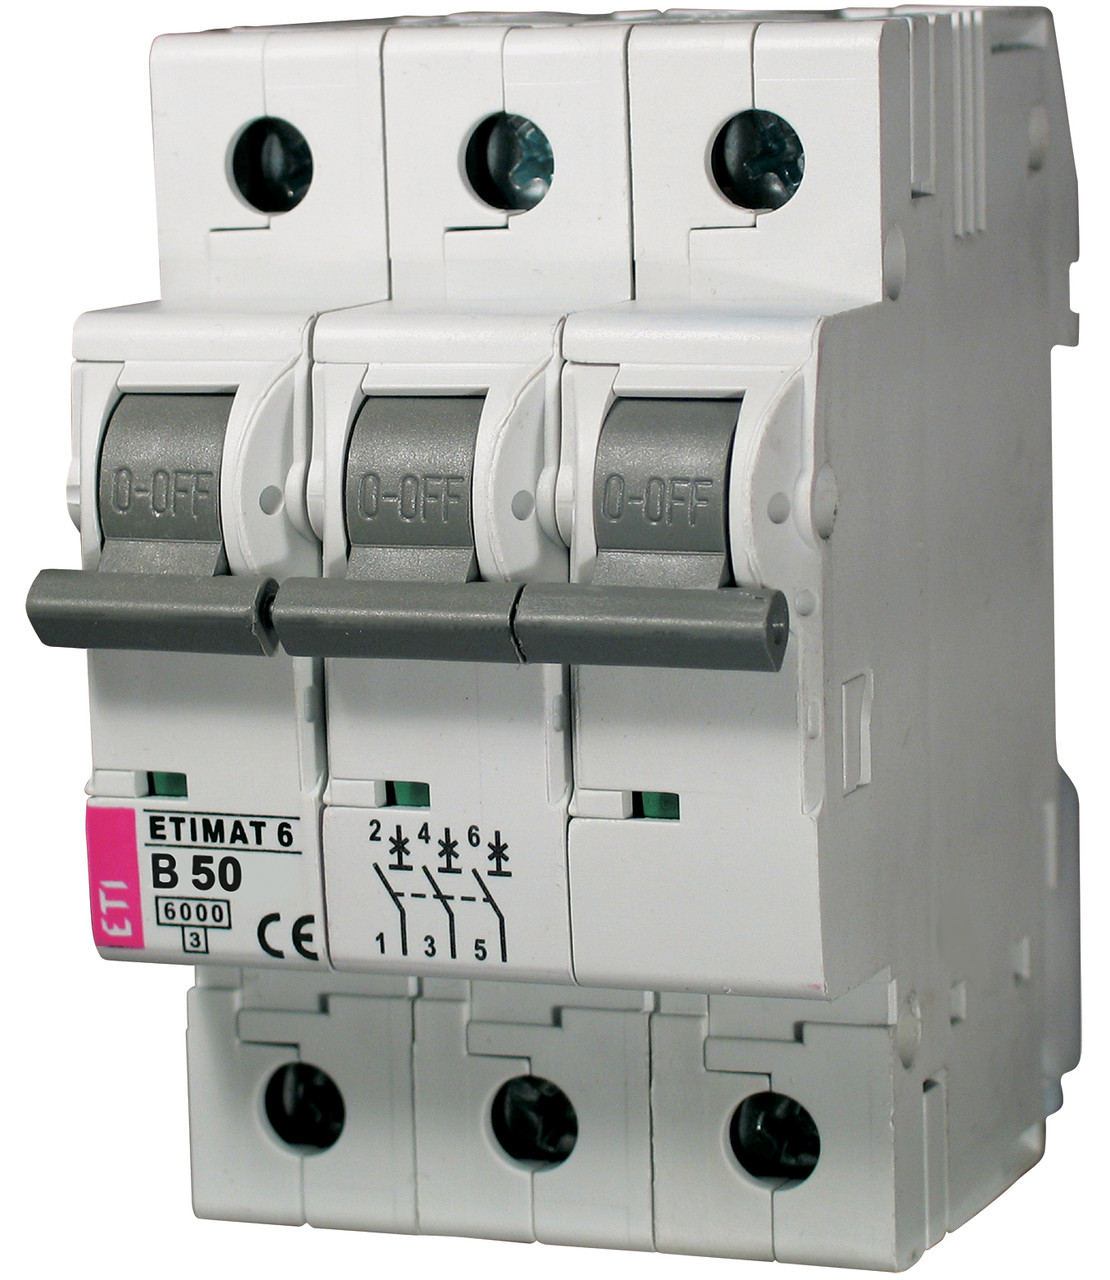 Авт. выключатель ETIMAT 6 3p B 50А (6 kA), ETI, 2115521